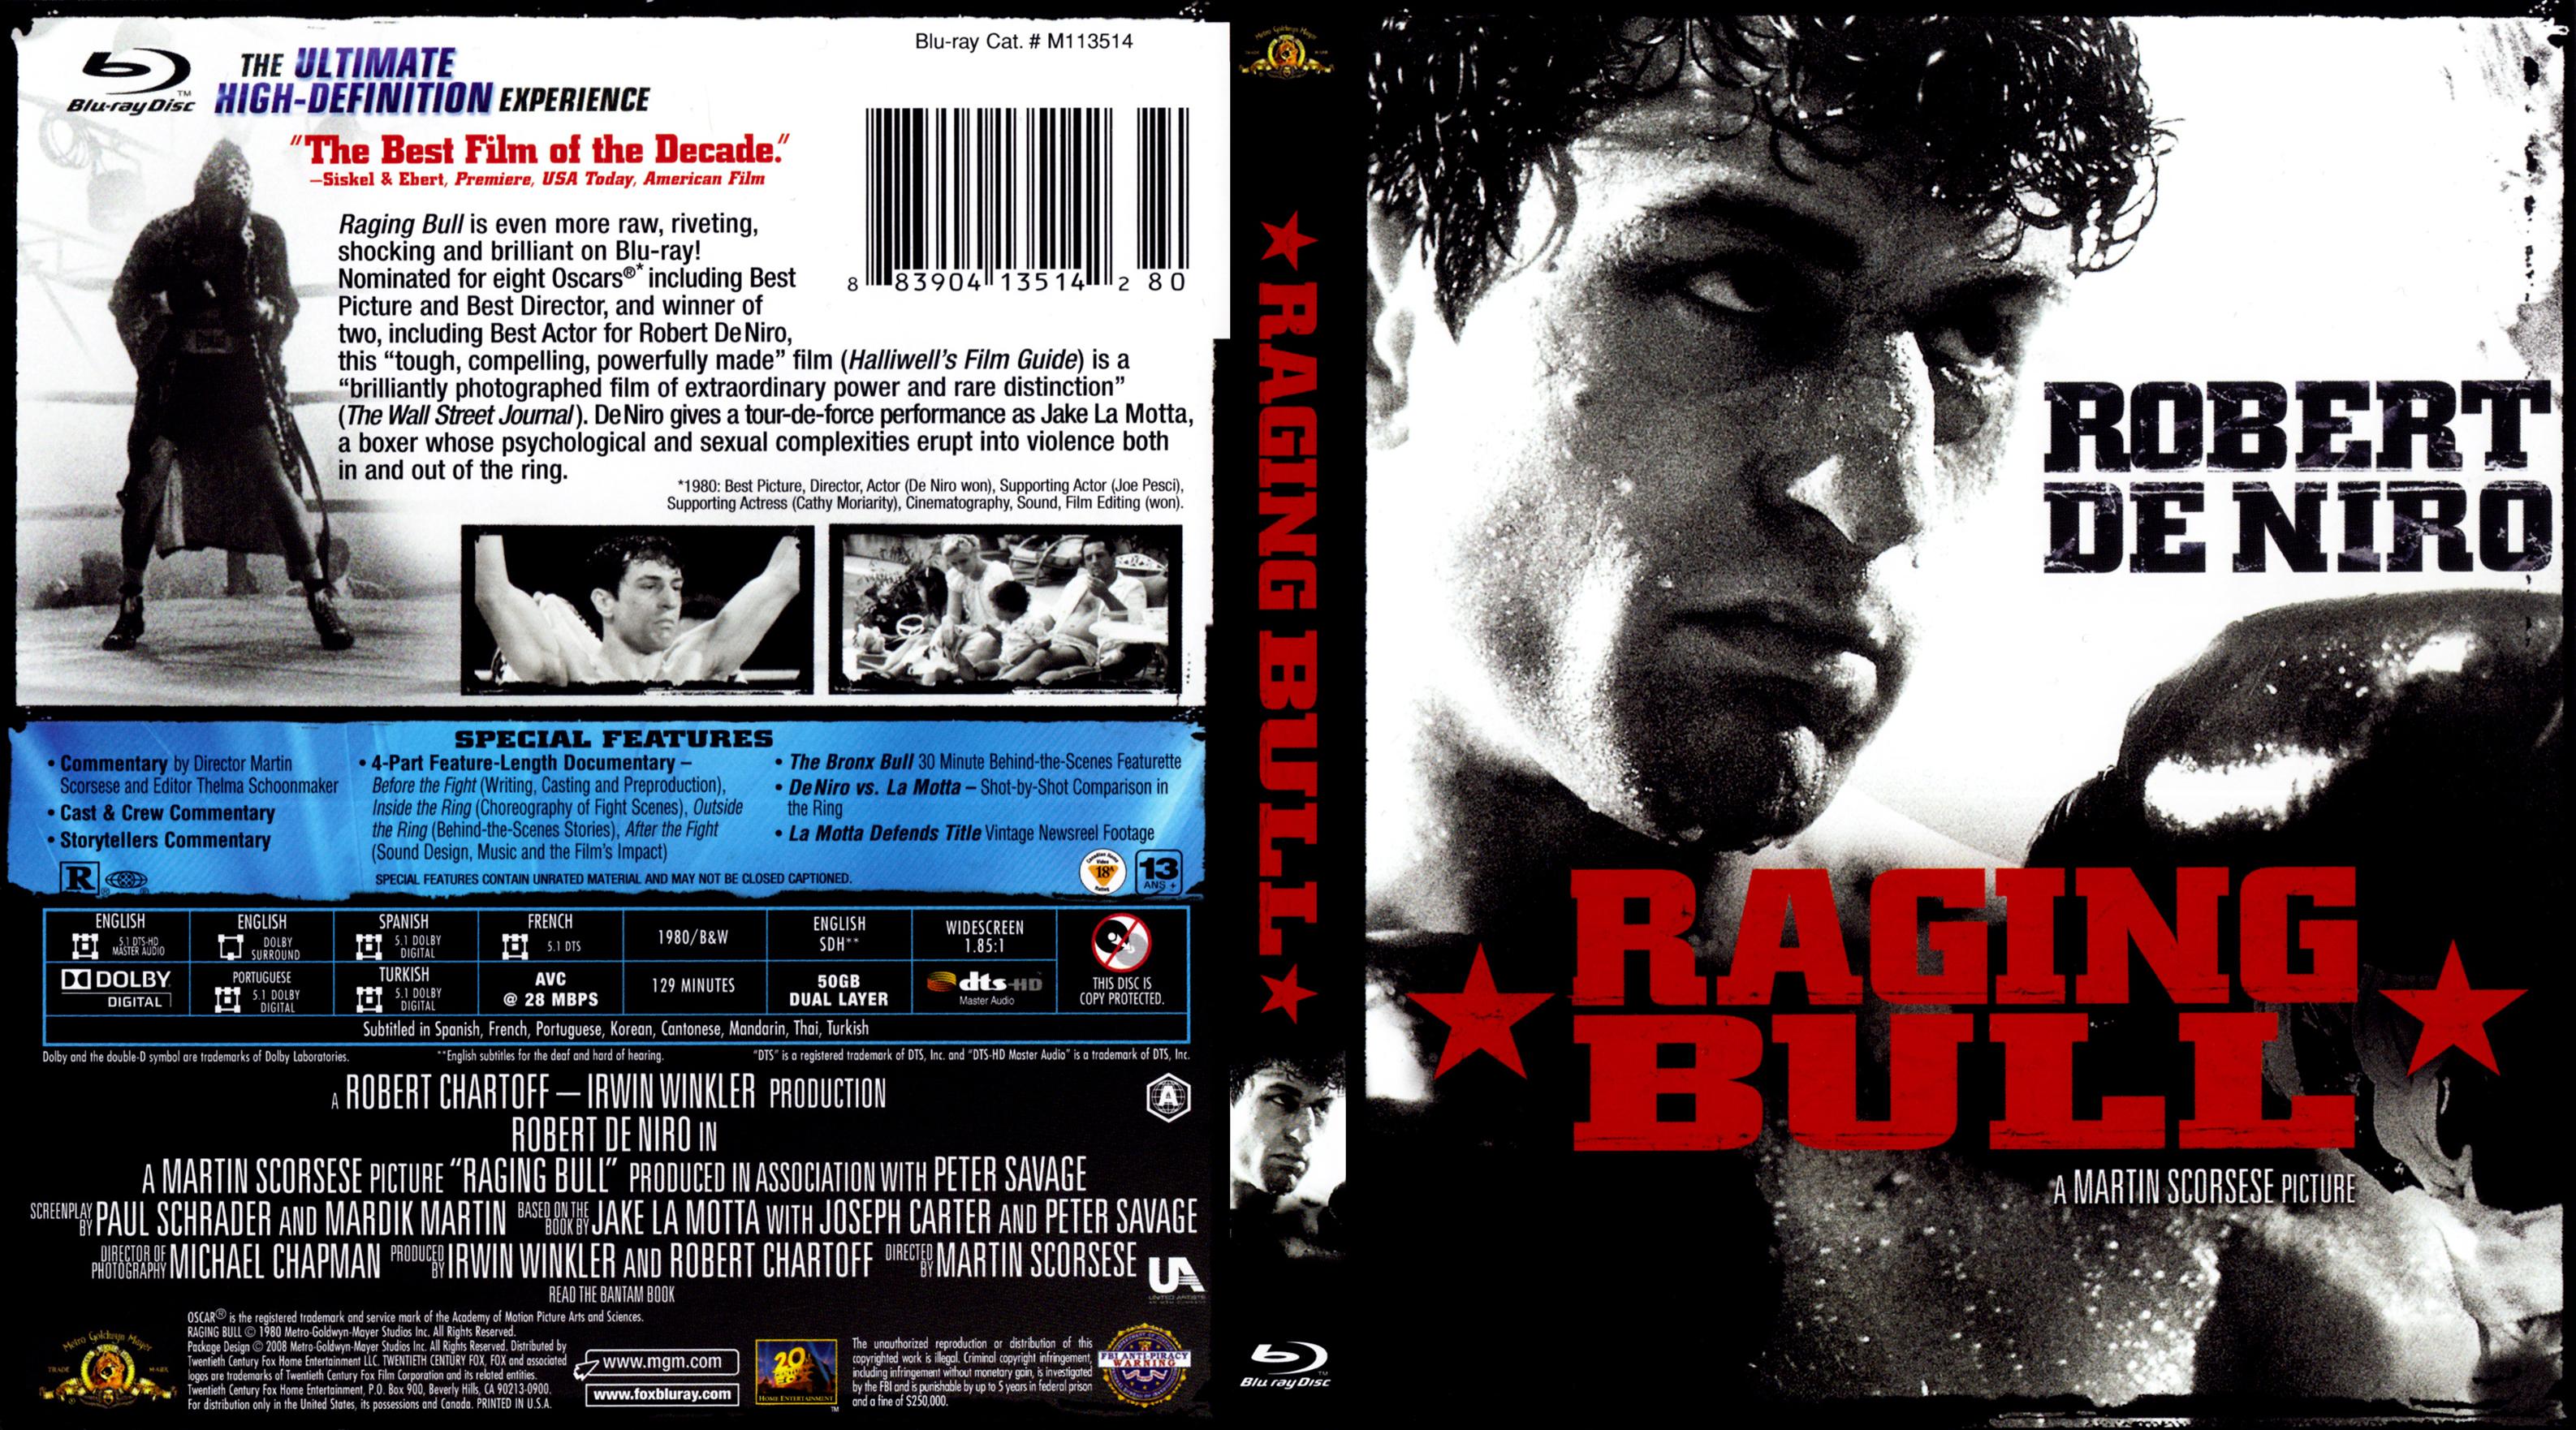 Raging bull movie pictures